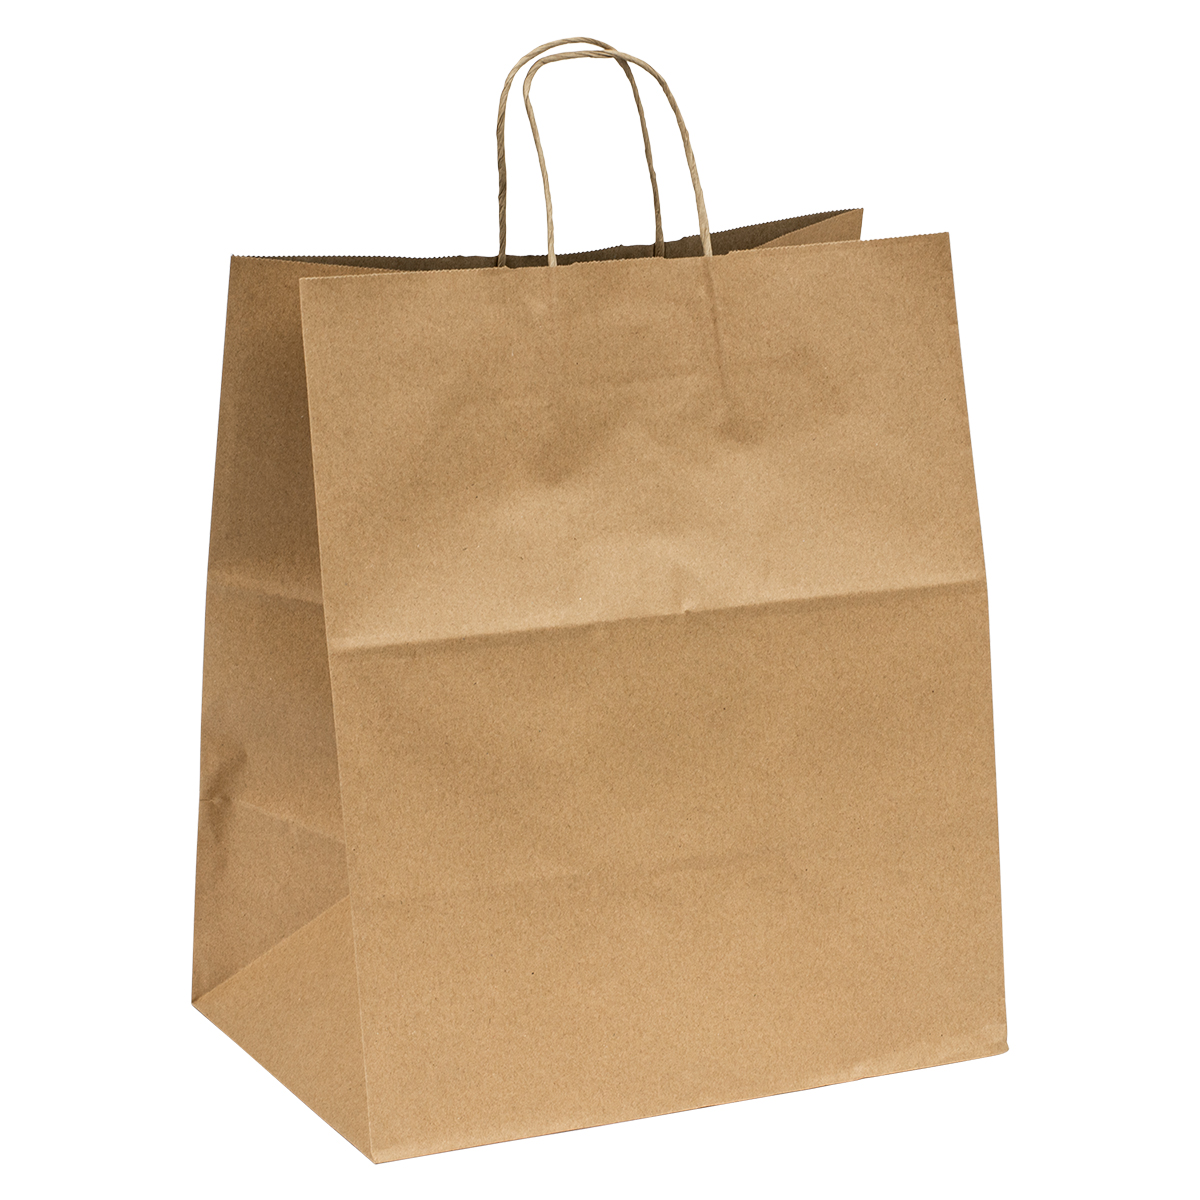 "Inno-Pak Super Royal Twist Handle Shopper Bag 14x9.6x16.5"" - 200ct"